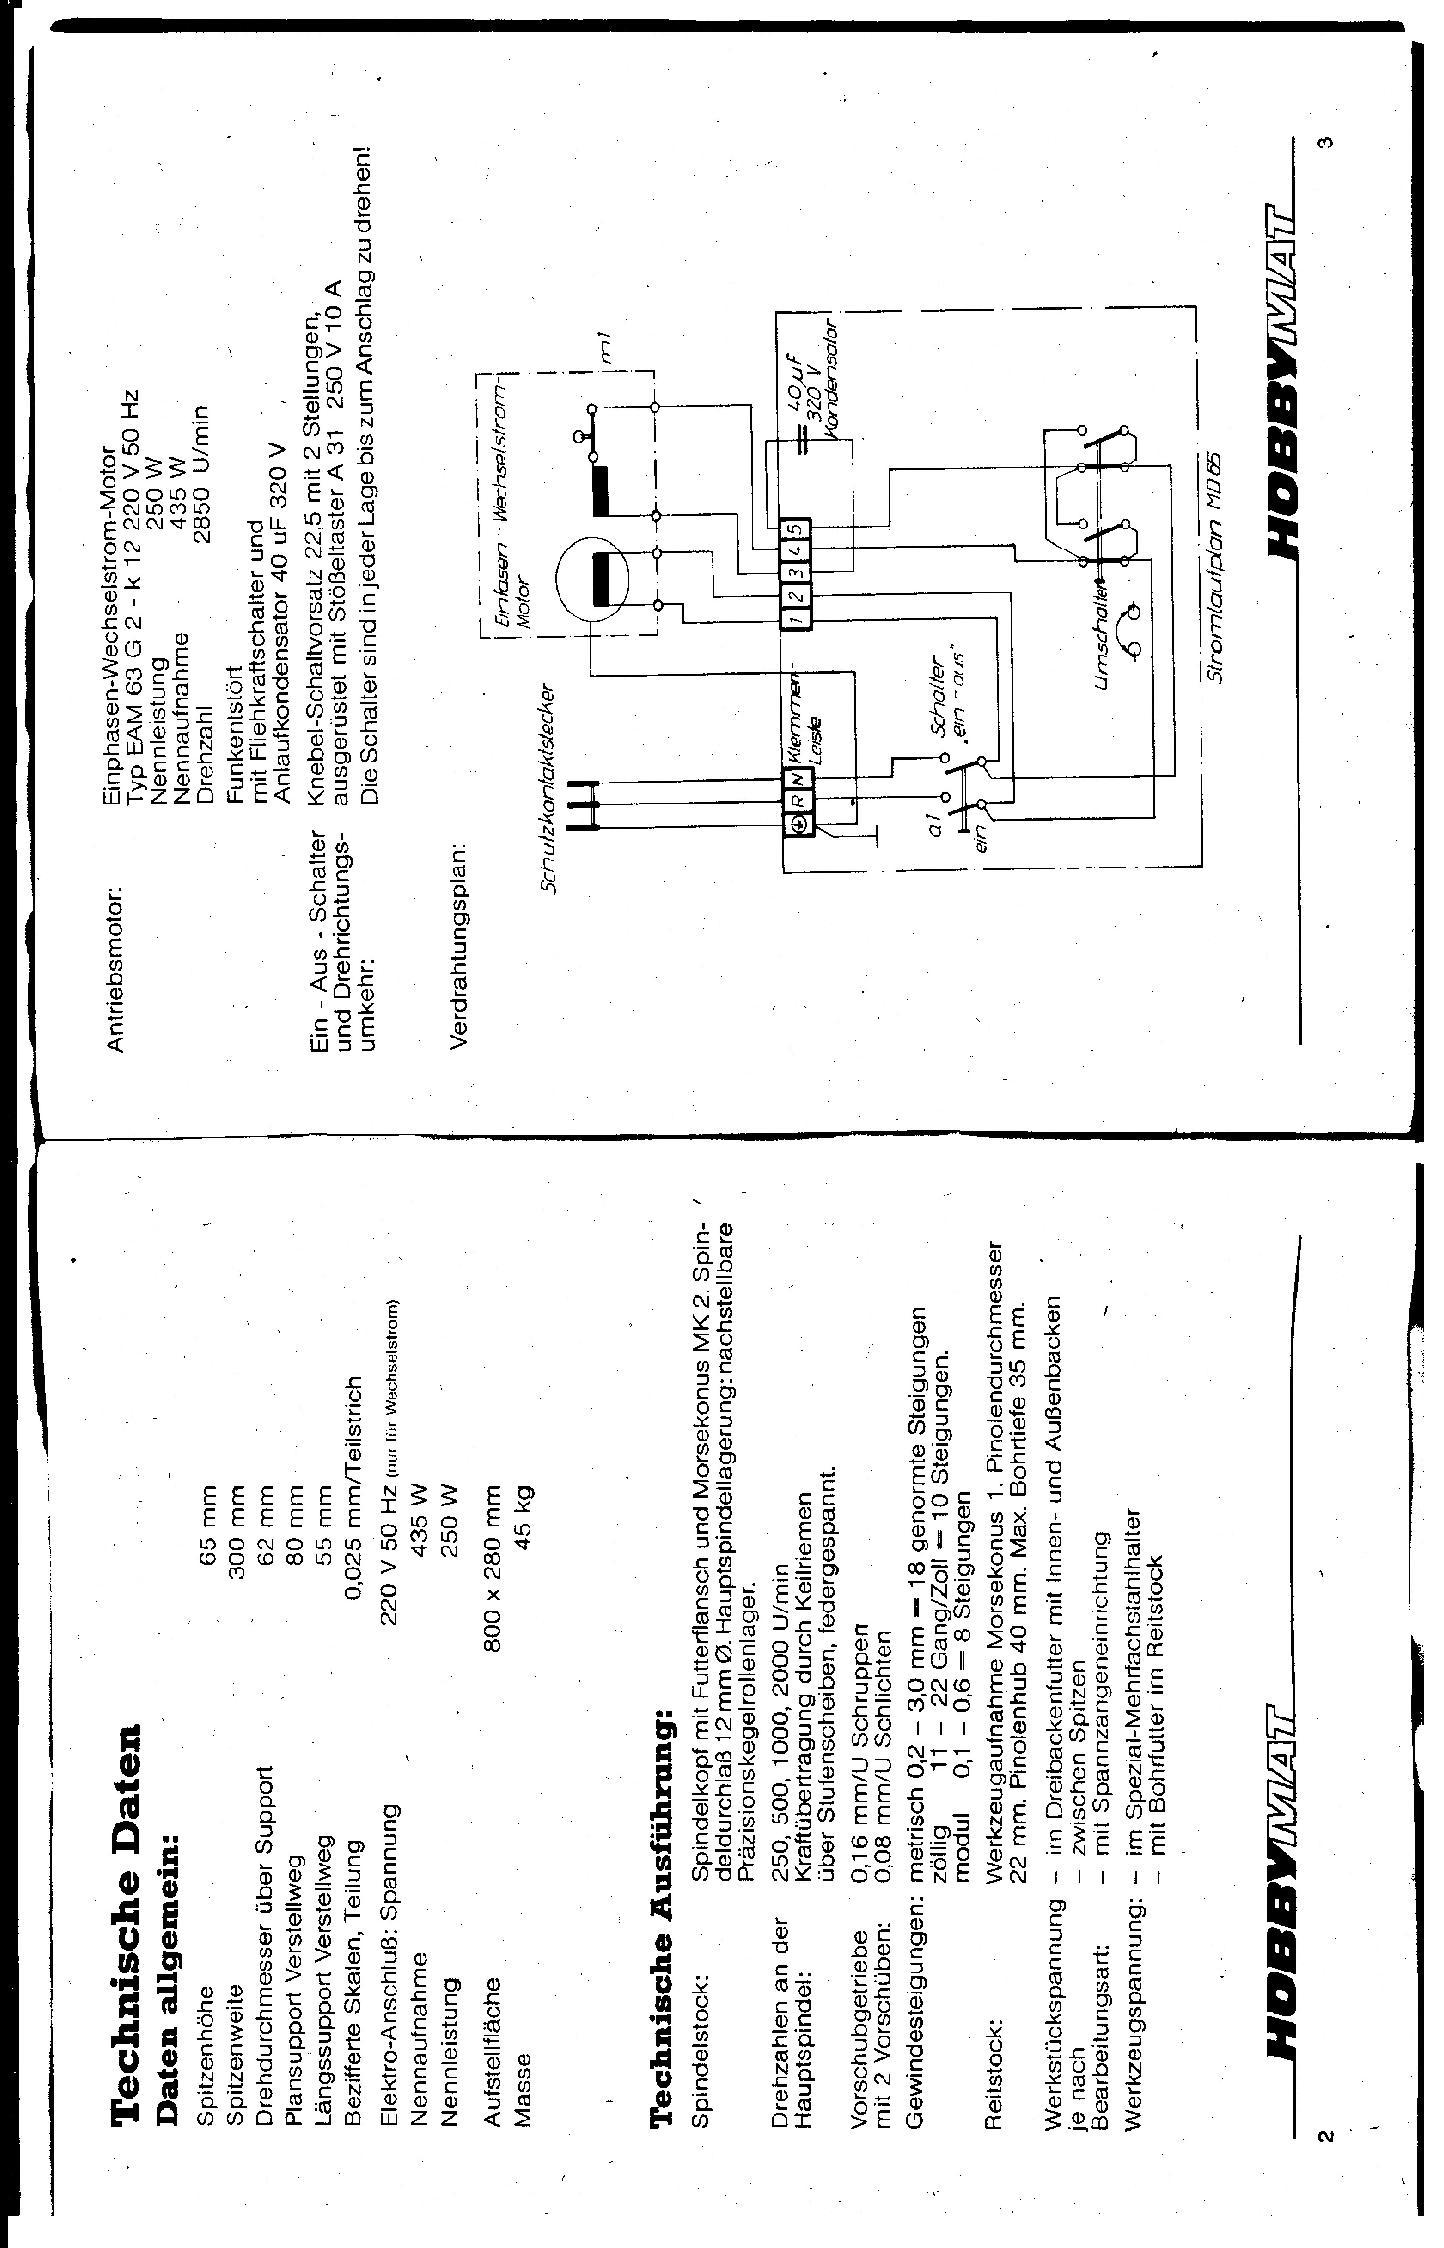 Beste Wechselstrom Elektromotor Schaltplan Fotos - Elektrische ...